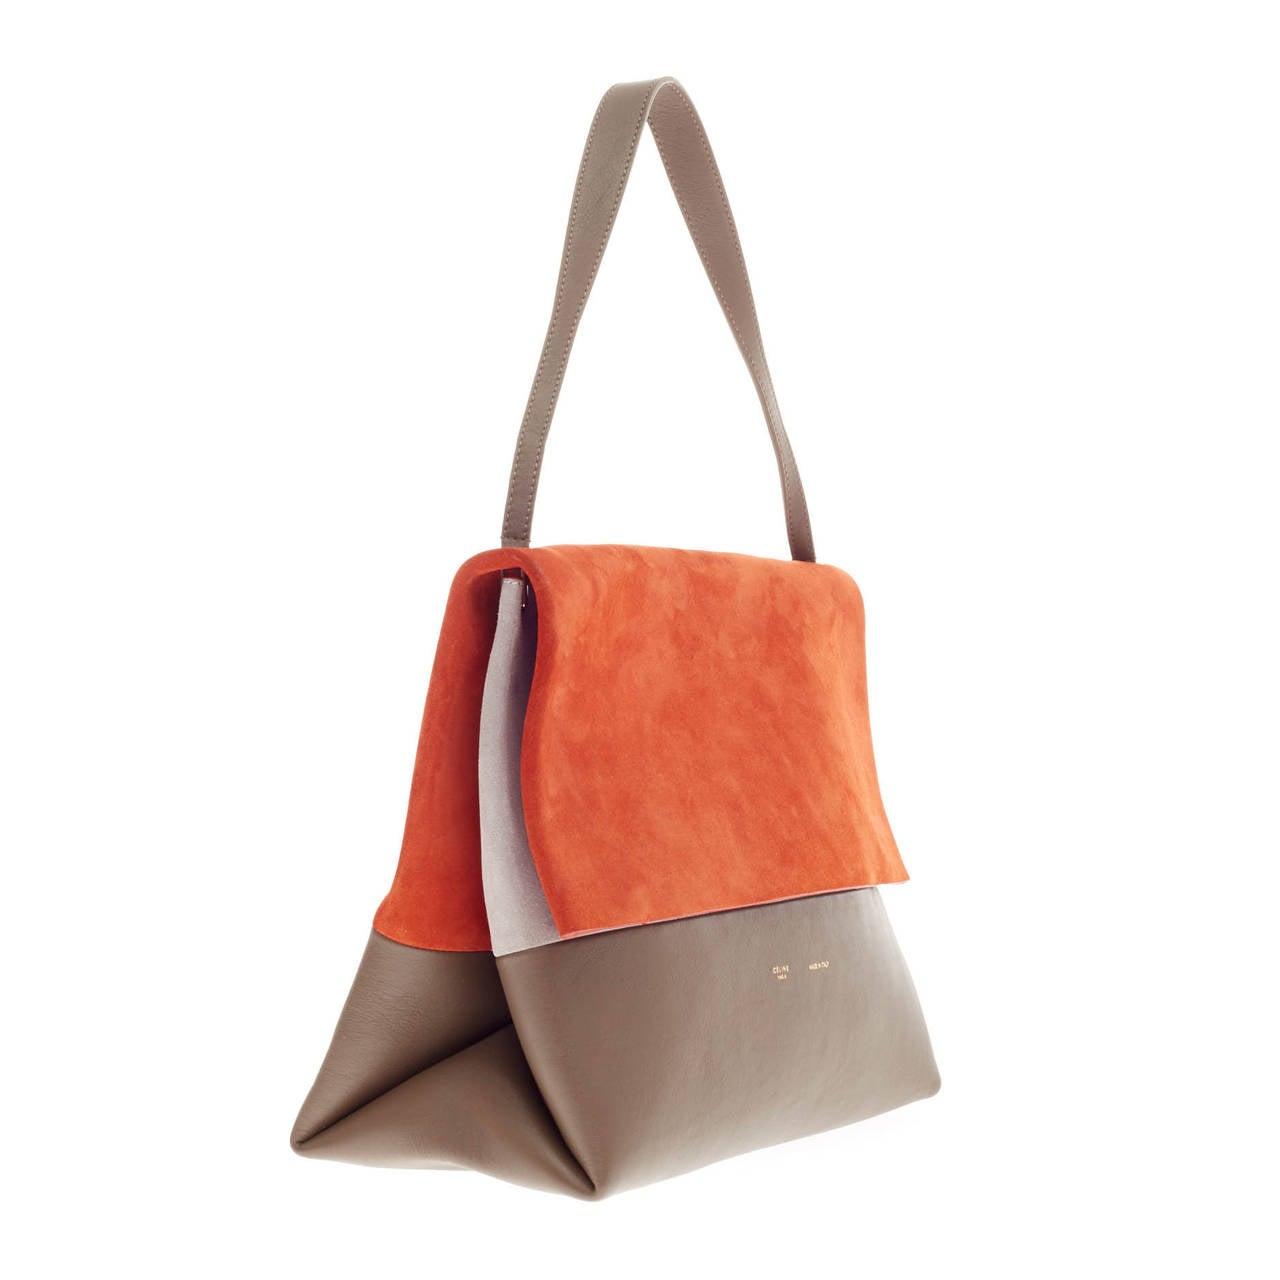 celine replica handbag - Celine All Soft Tote Suede at 1stdibs